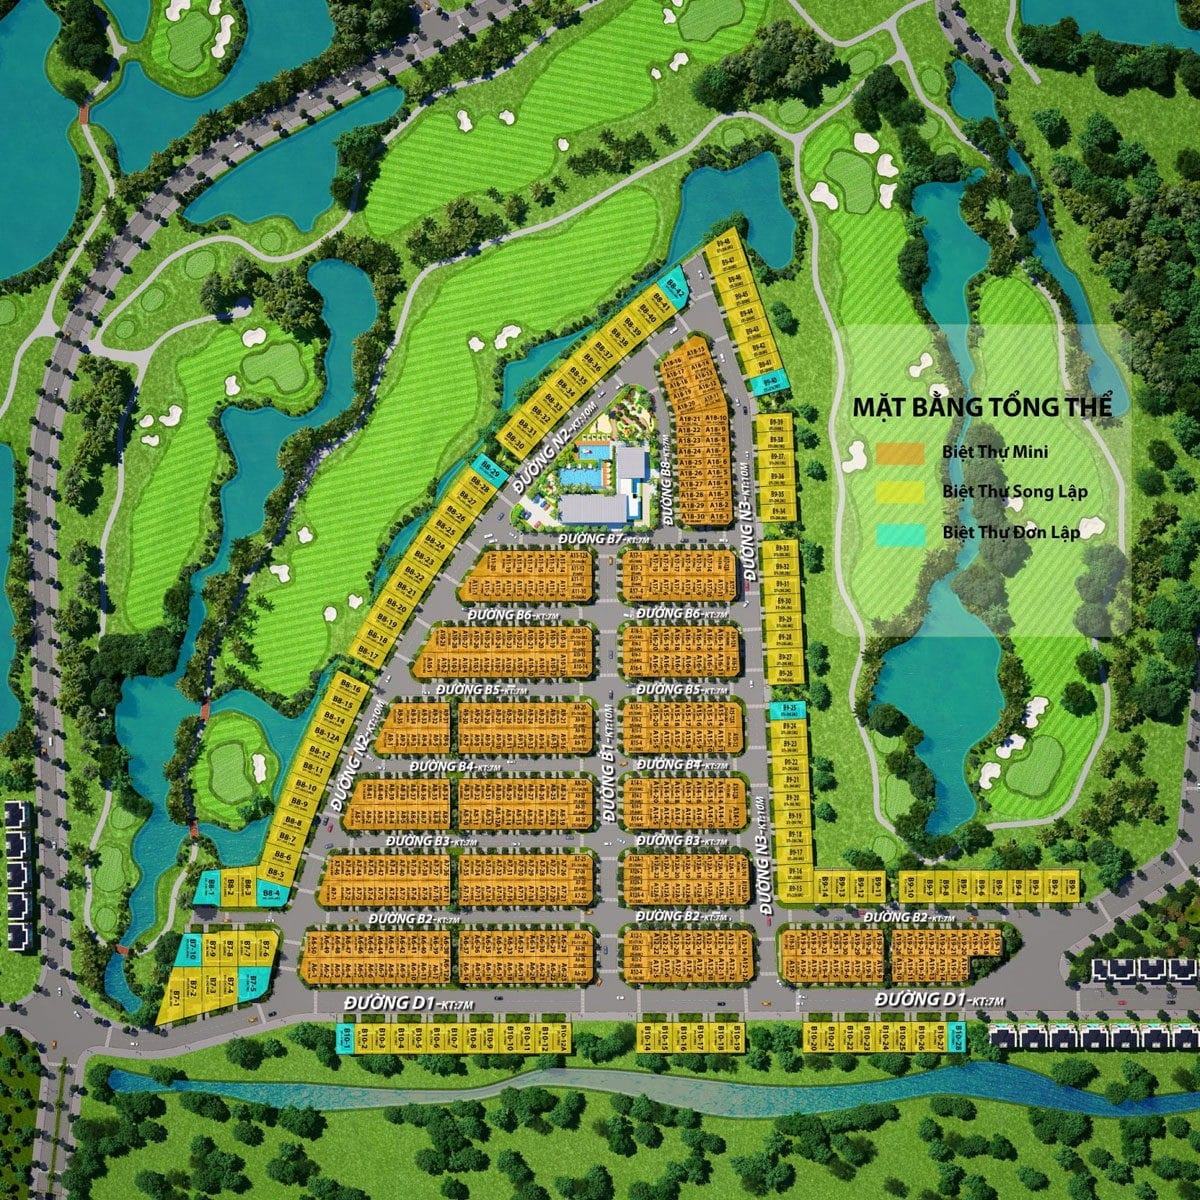 mat bang phan lo du an west lakes golf villas long an - DỰ ÁN WEST LAKES GOLF & VILLAS LONG AN